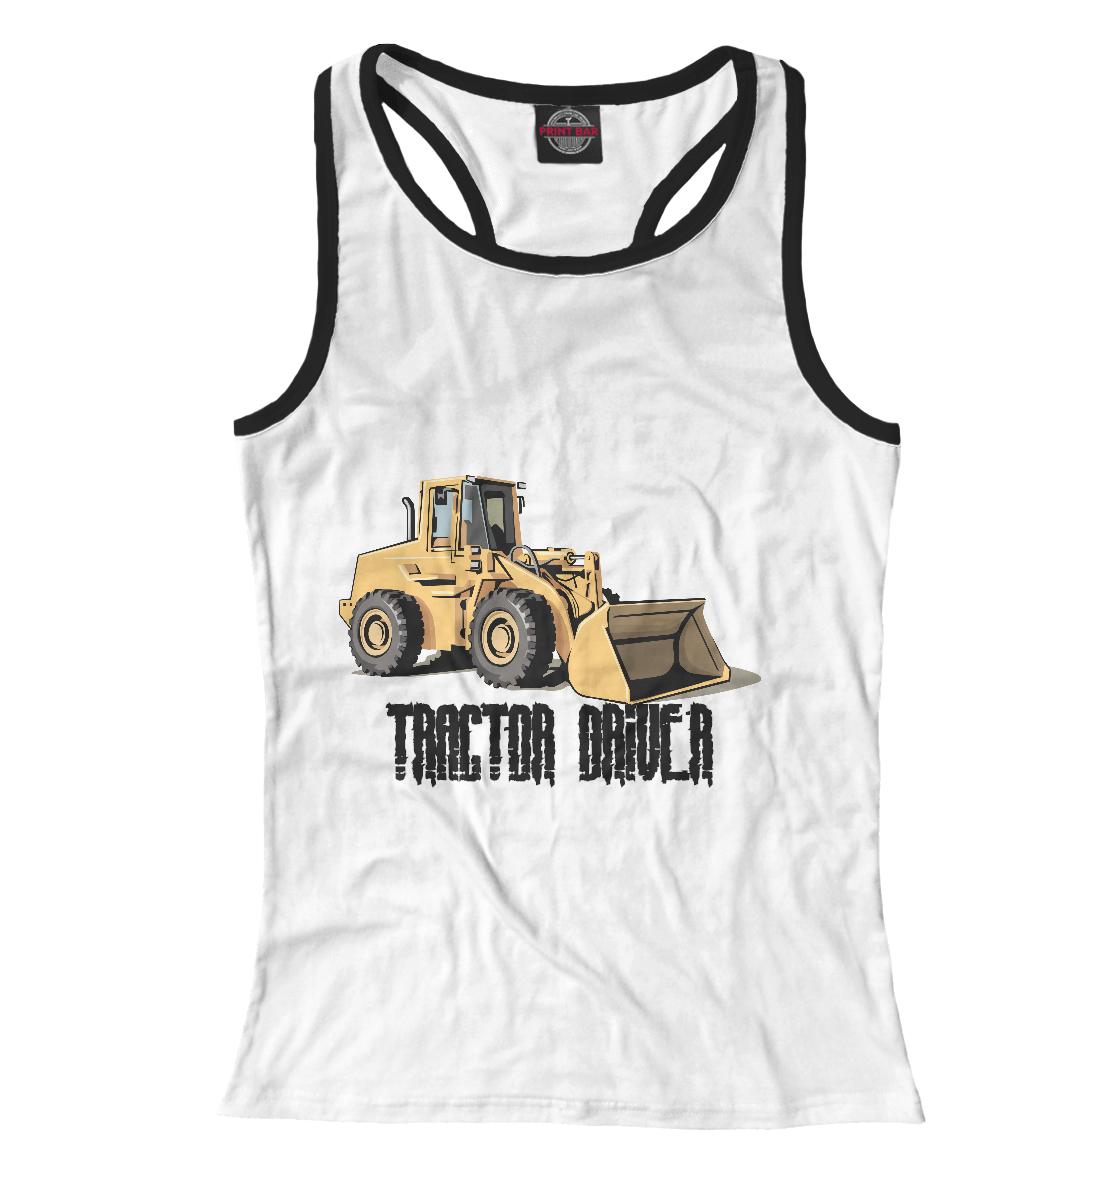 Купить Tractor driver, Printbar, Майки борцовки, VDT-264157-mayb-1